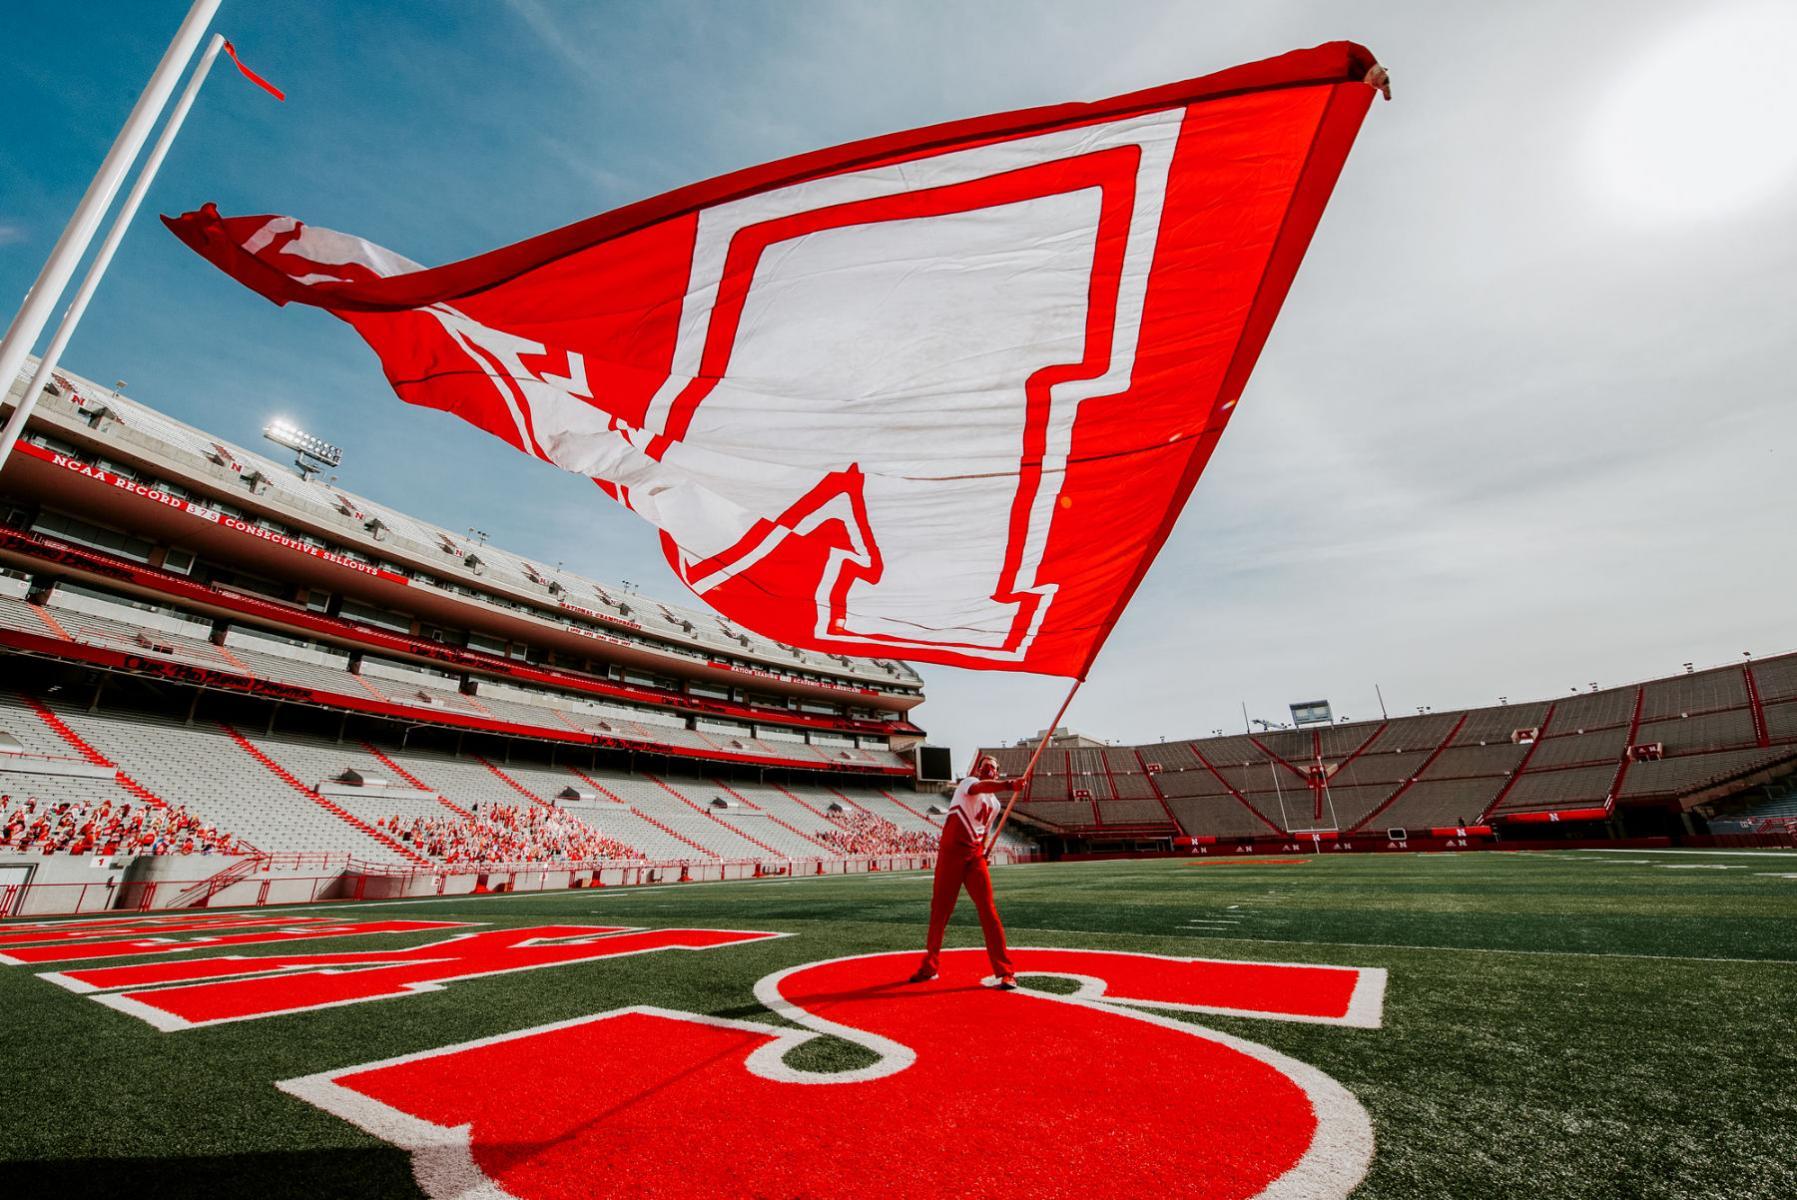 Student waving Nebraska flag while standing on field at Memorial Stadium